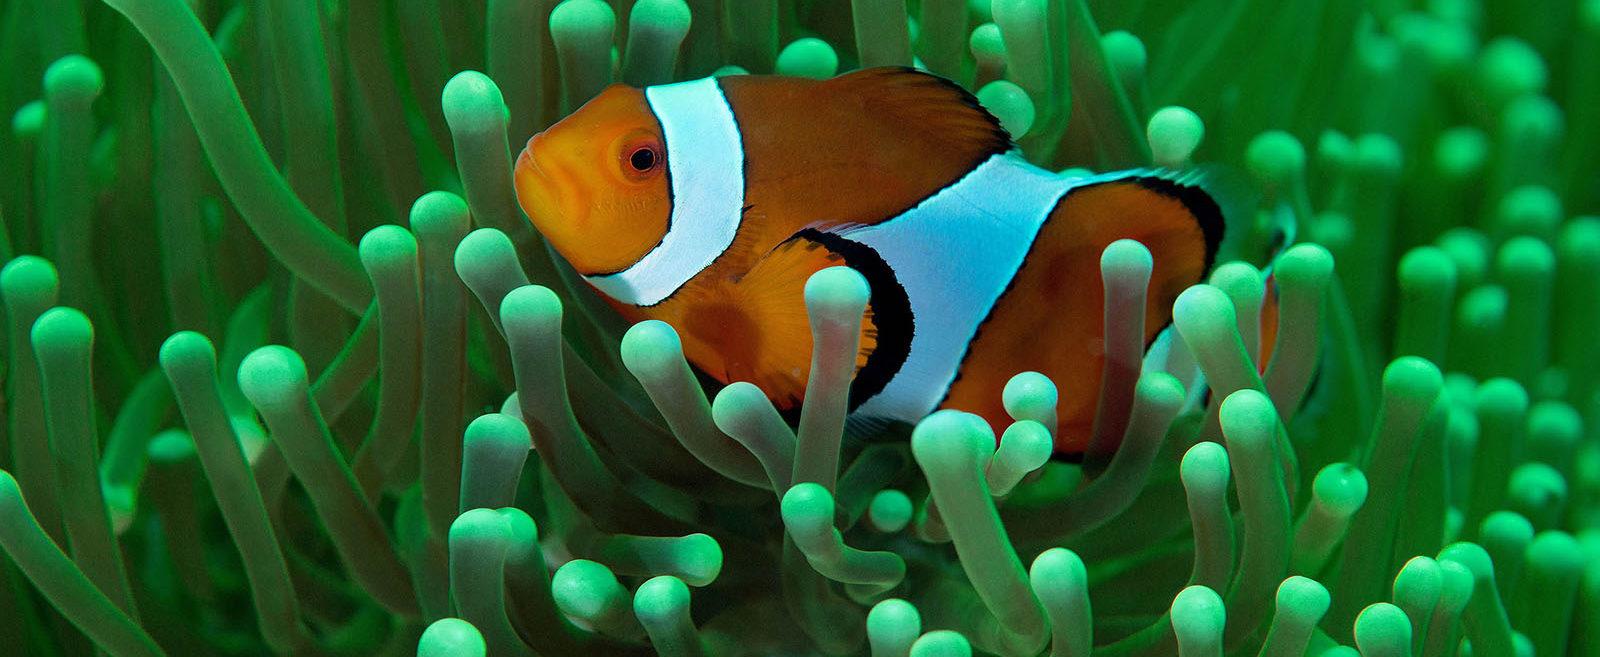 Philippines, Moalboal, Anemone Fish